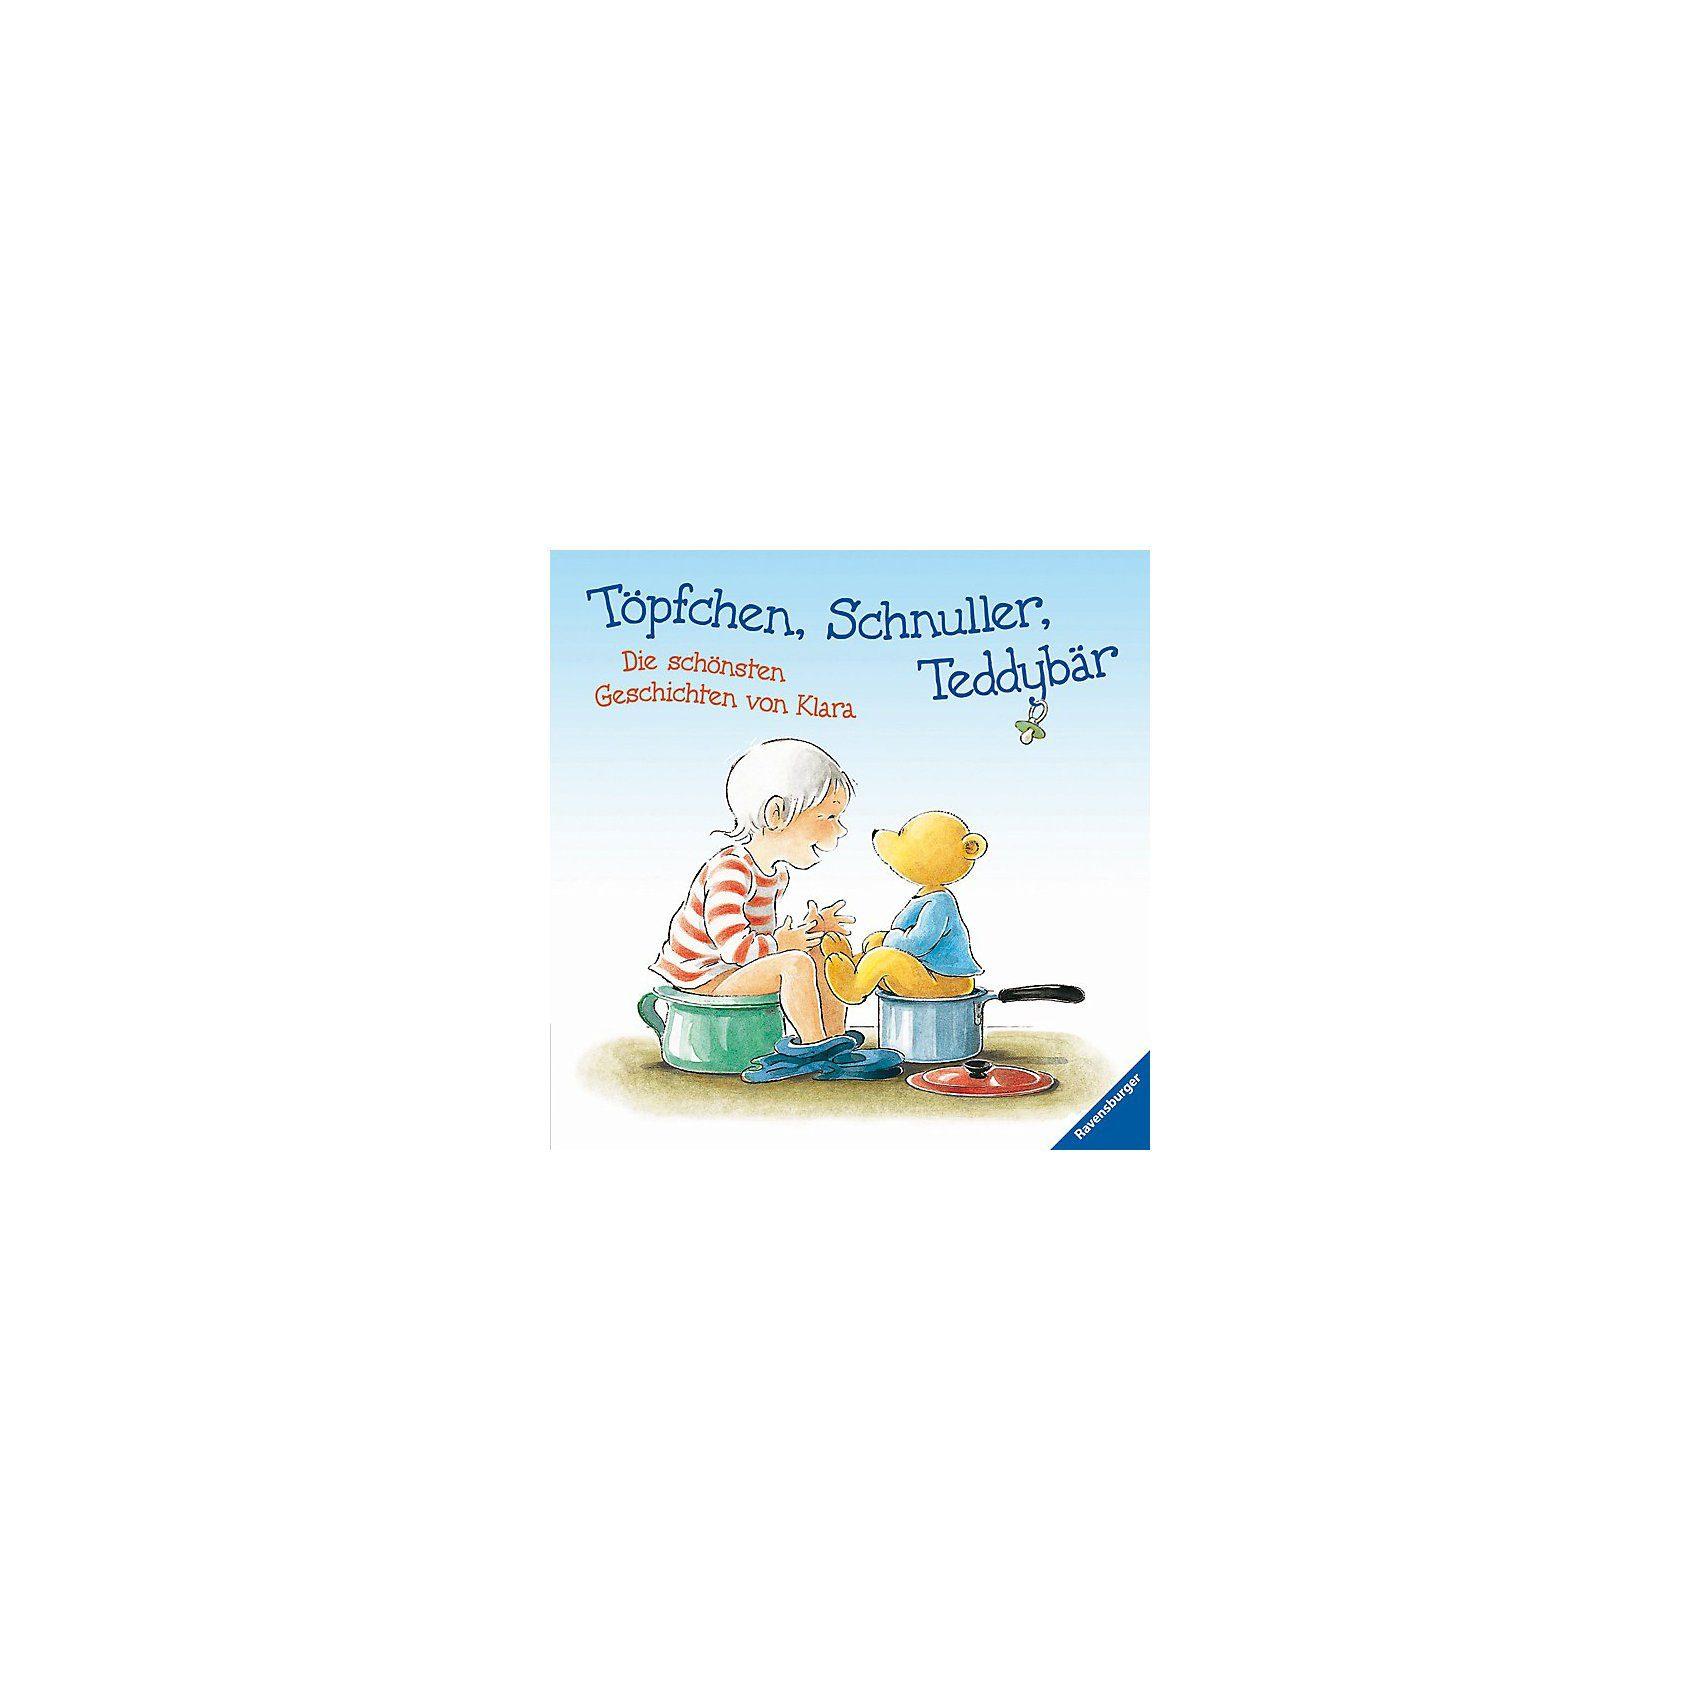 Ravensburger Sammelband: Töpfchen, Schnuller, Teddybär